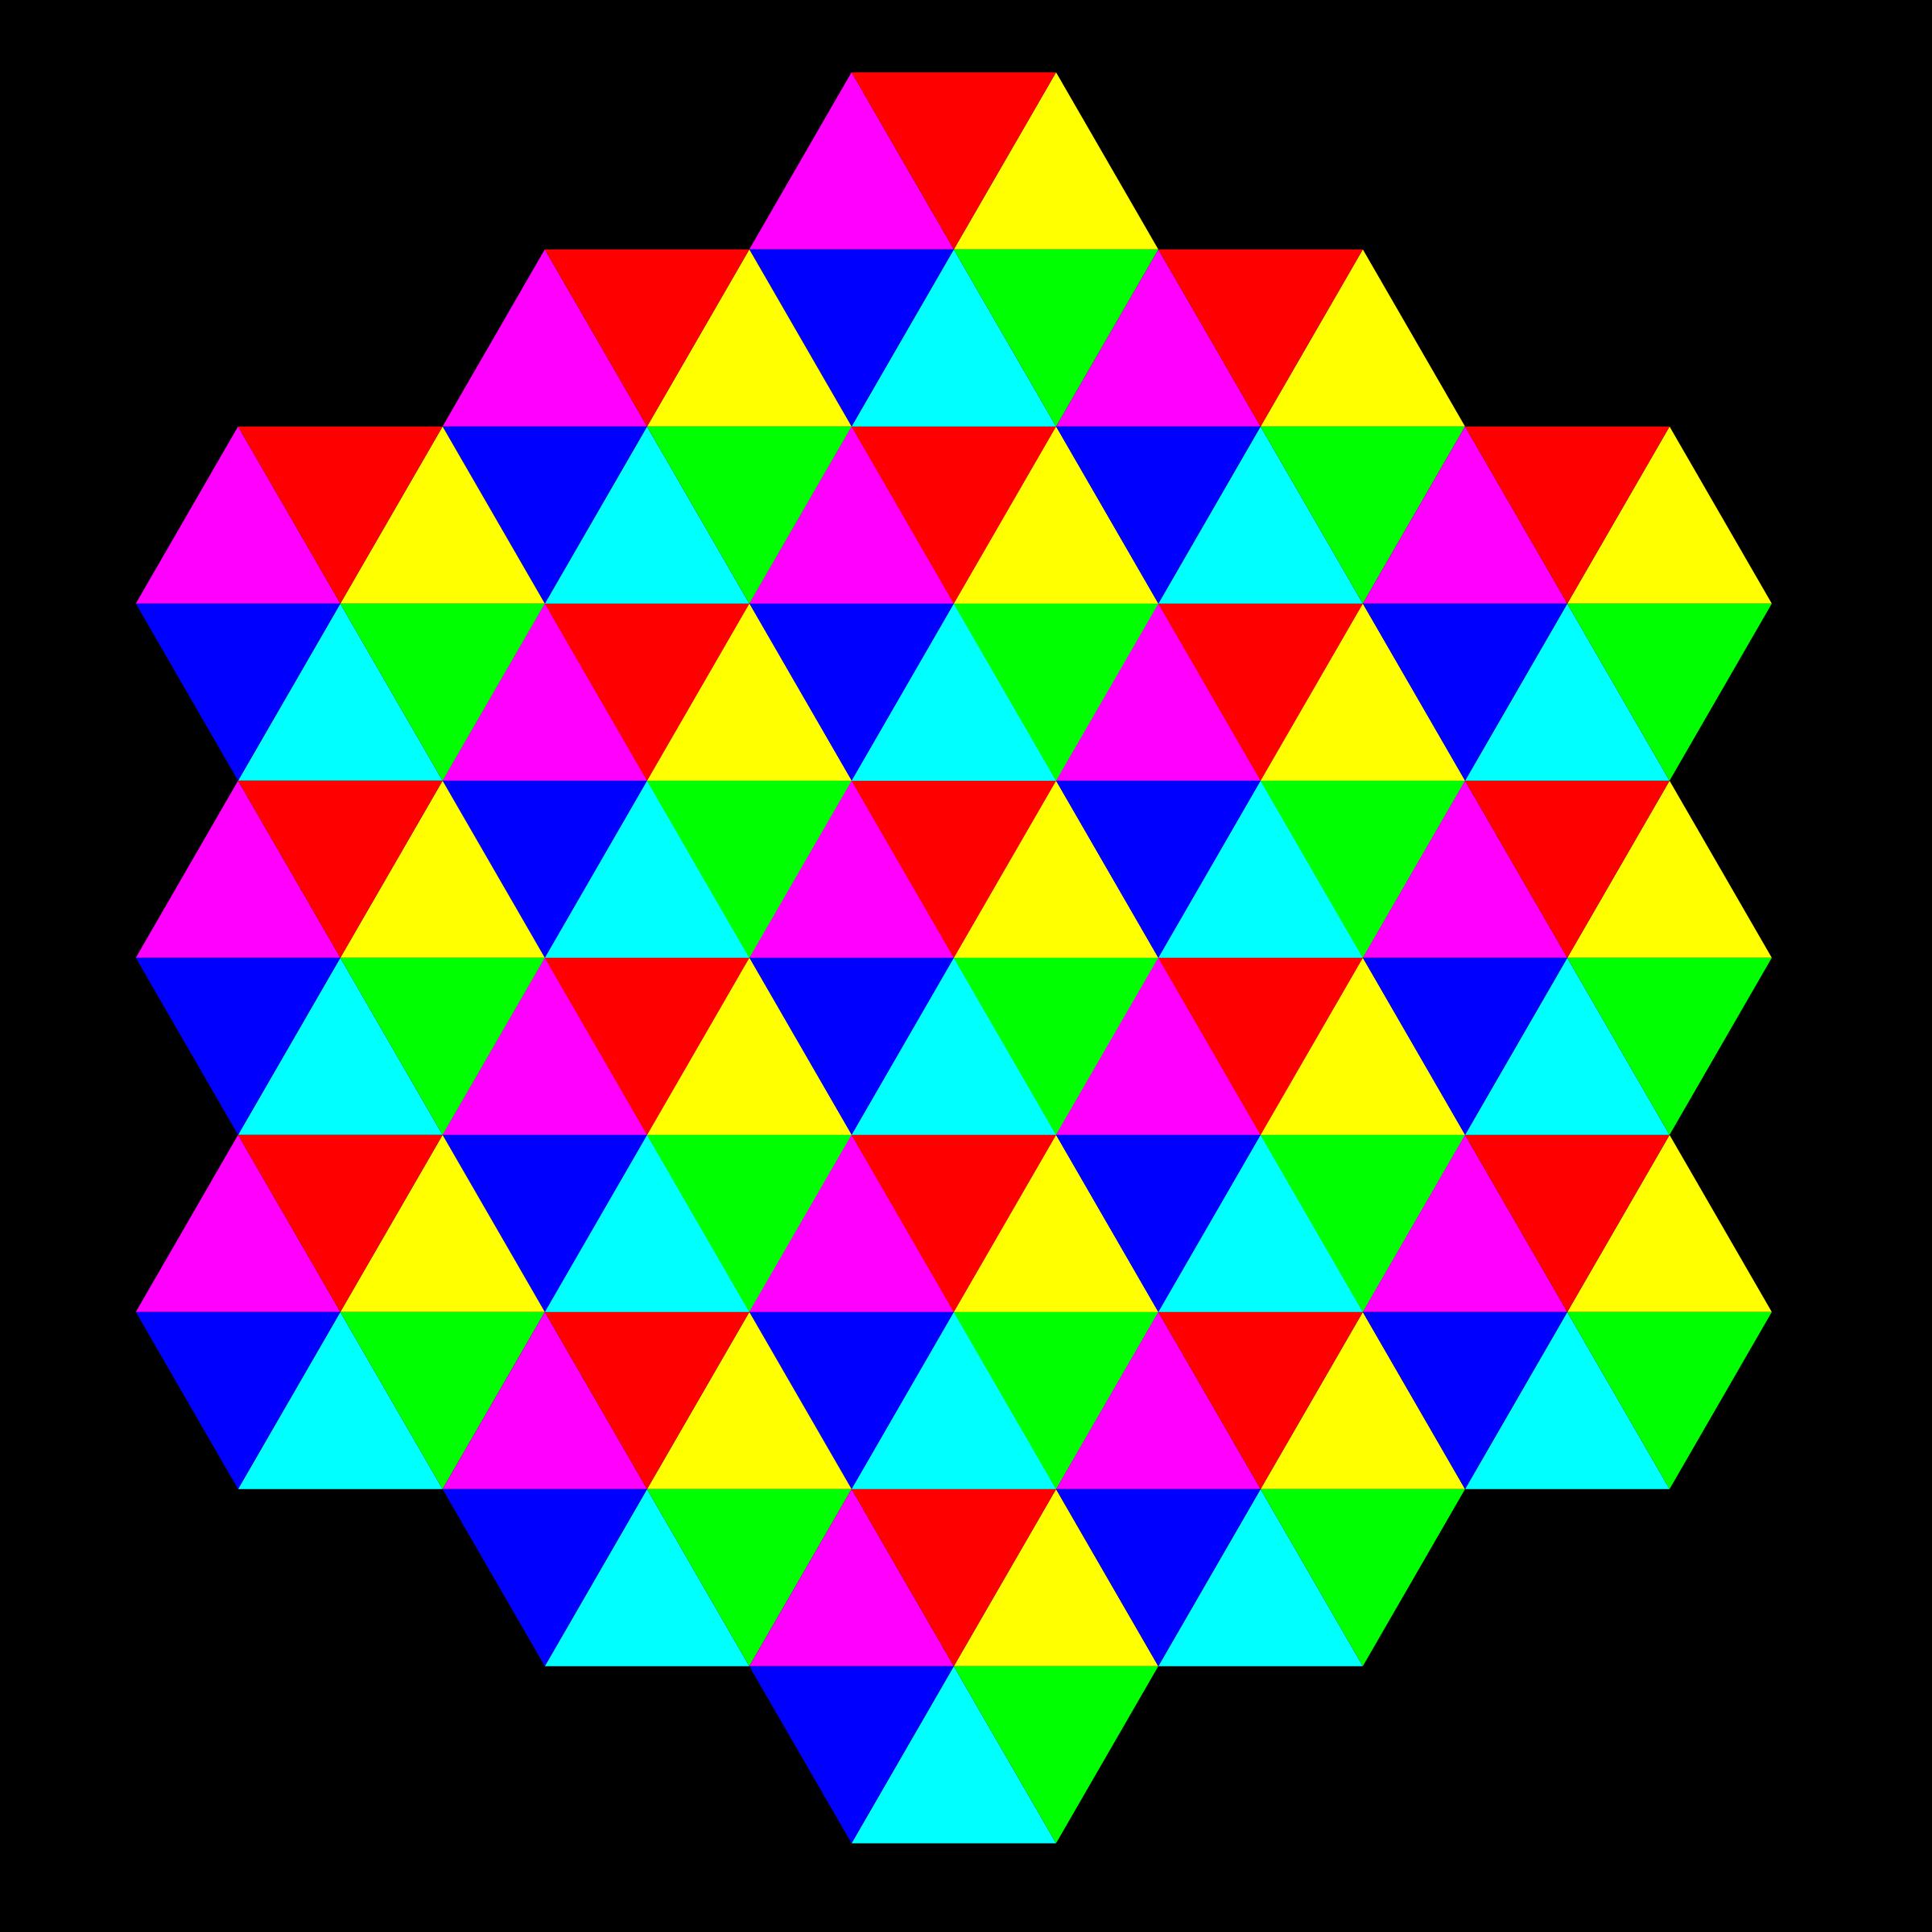 2400x2400 Tessellations